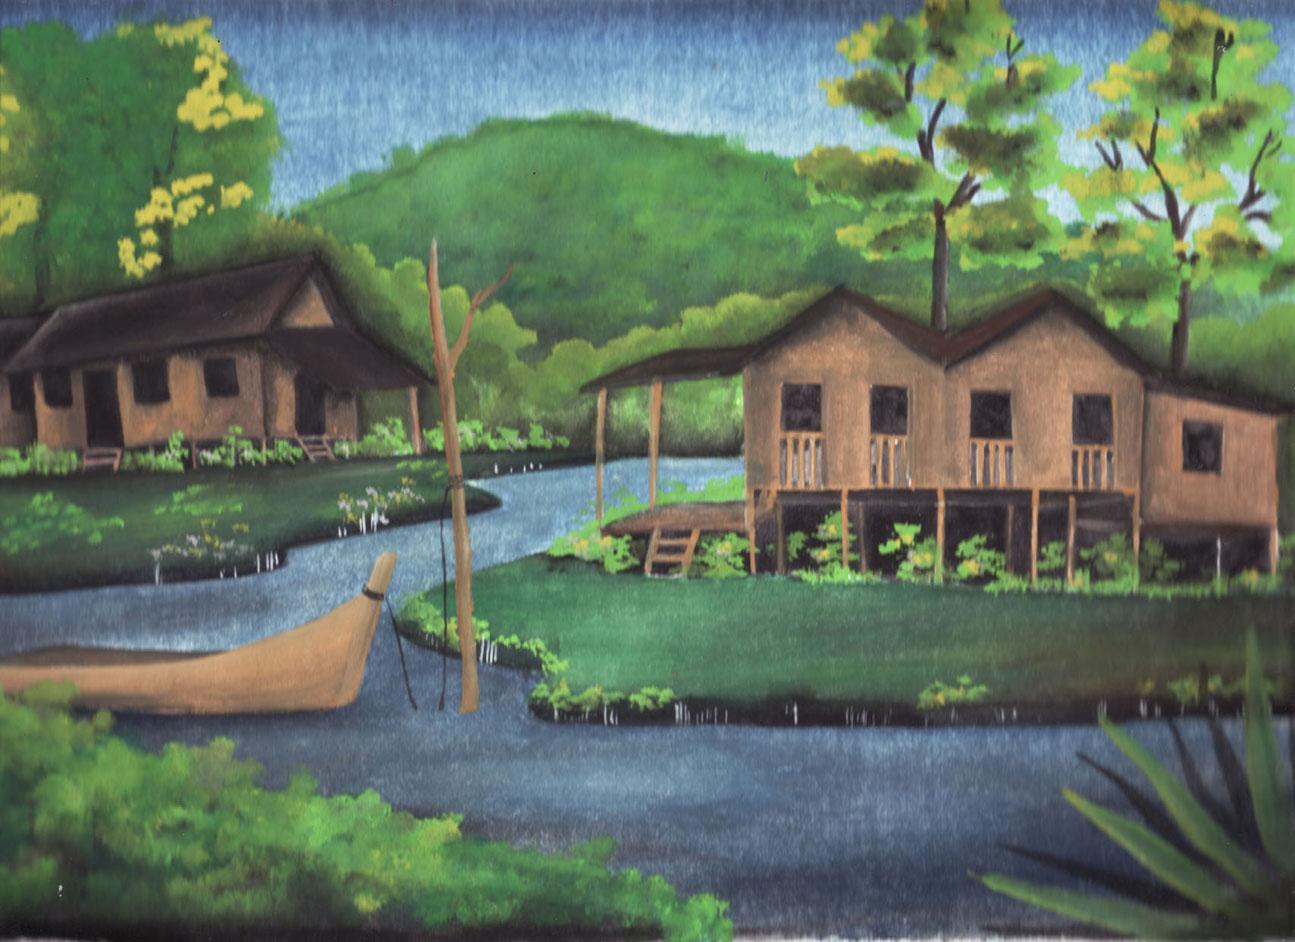 gambar pemandangan kampung - photo #9